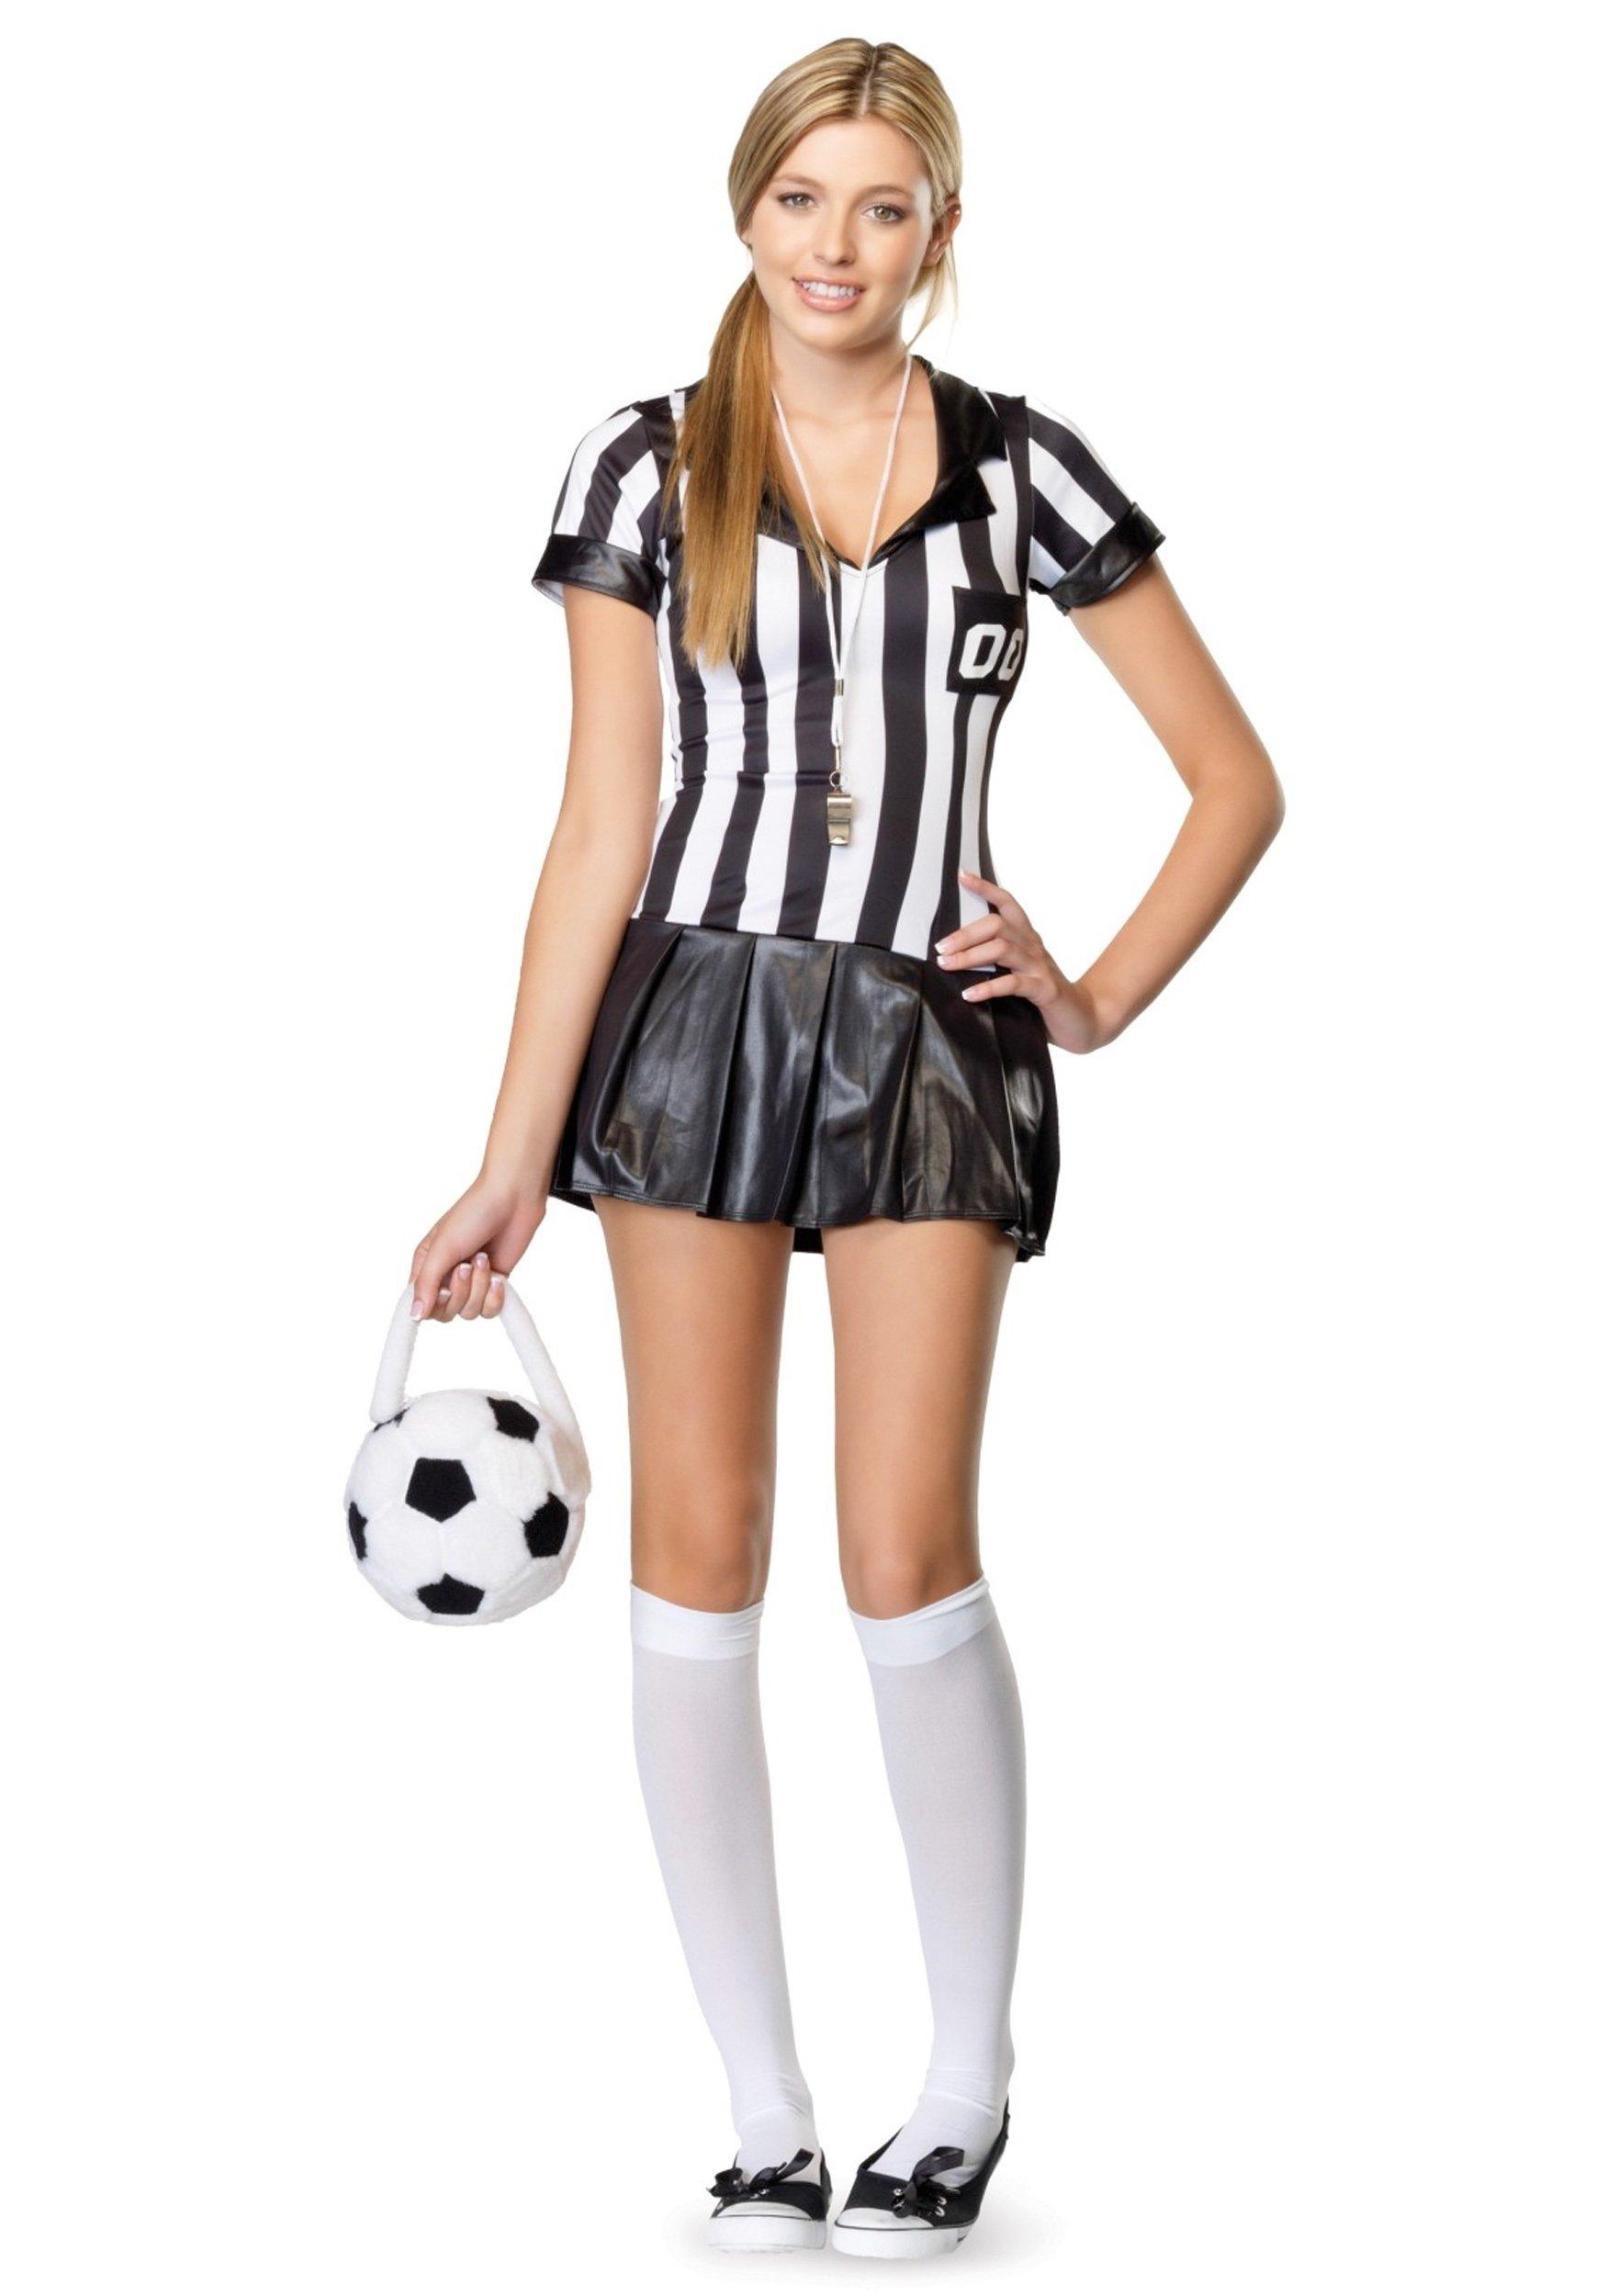 10 Nice Halloween Costume Ideas For Teenage Girls cuteteencostumes home costume ideas sports costumes referee 5 2021